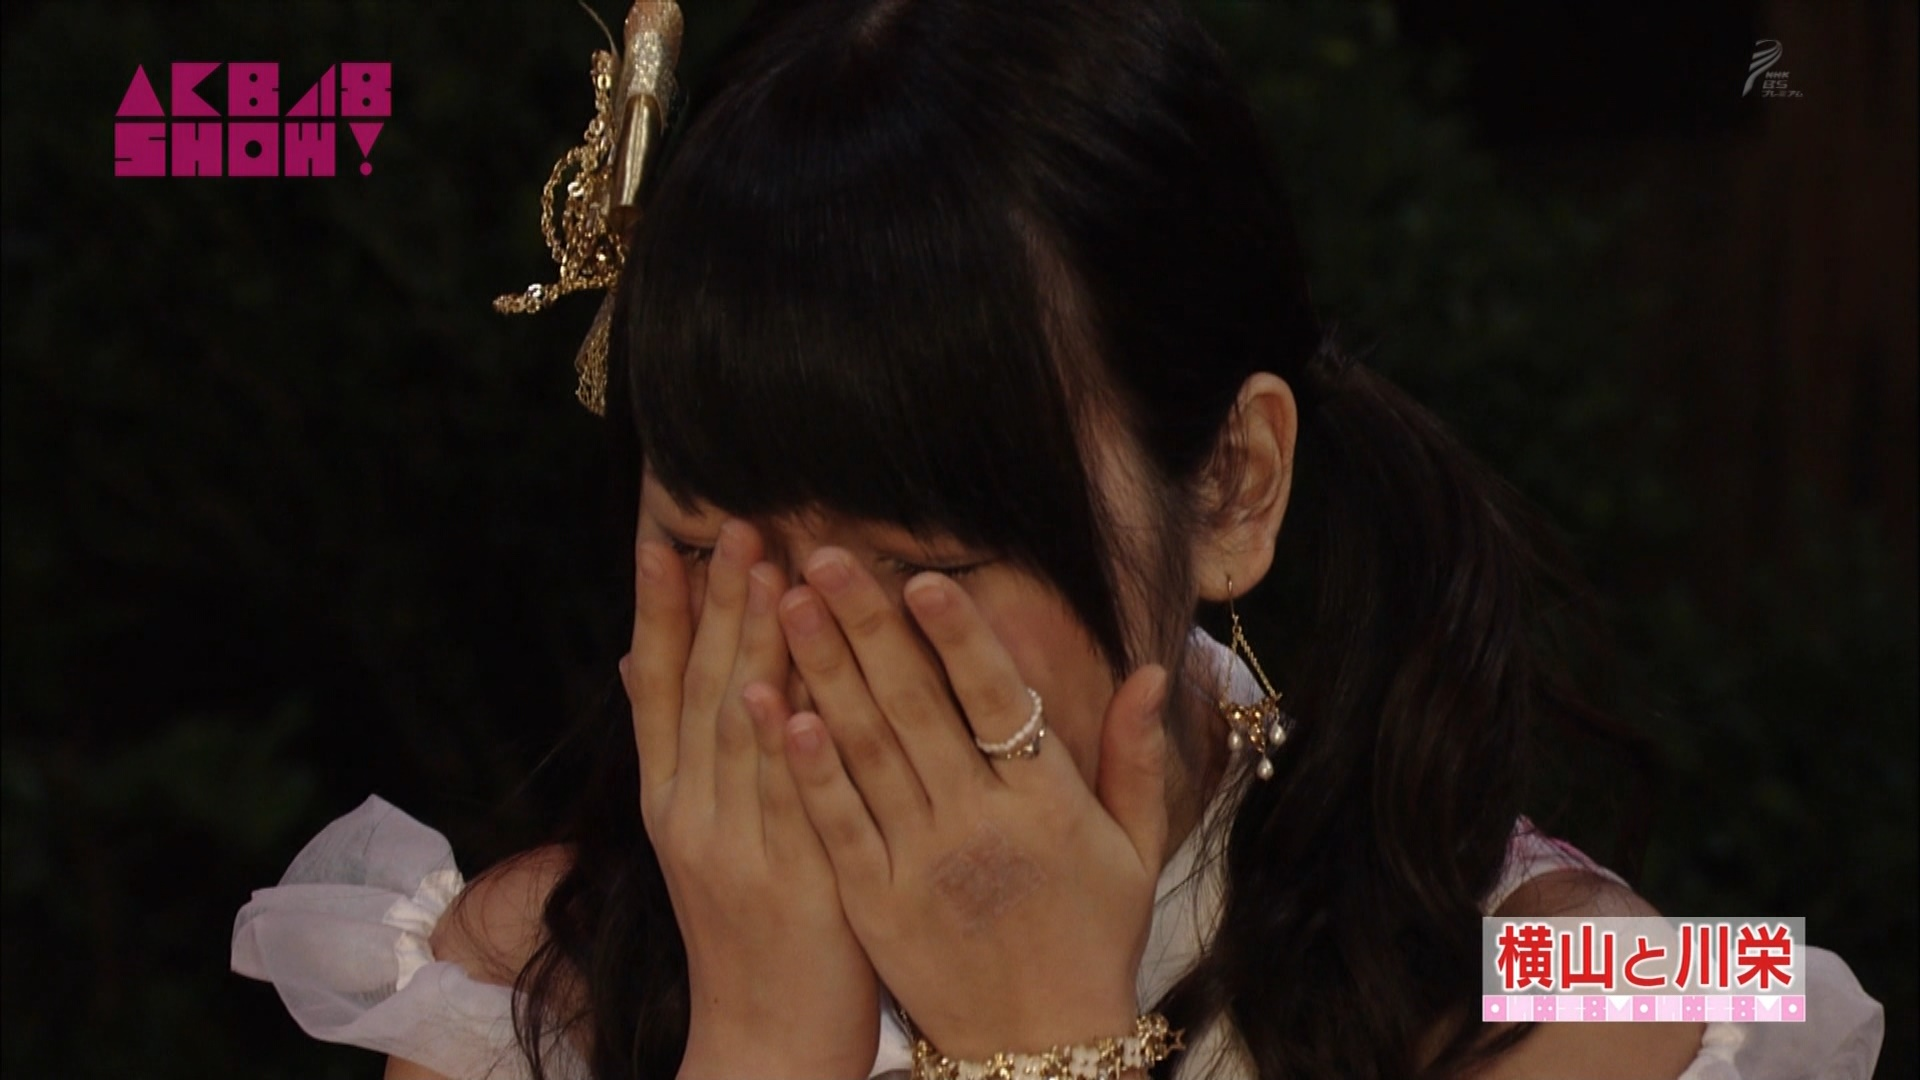 横山由依と川栄李奈 AKB48SHOW! 20140906 (19)